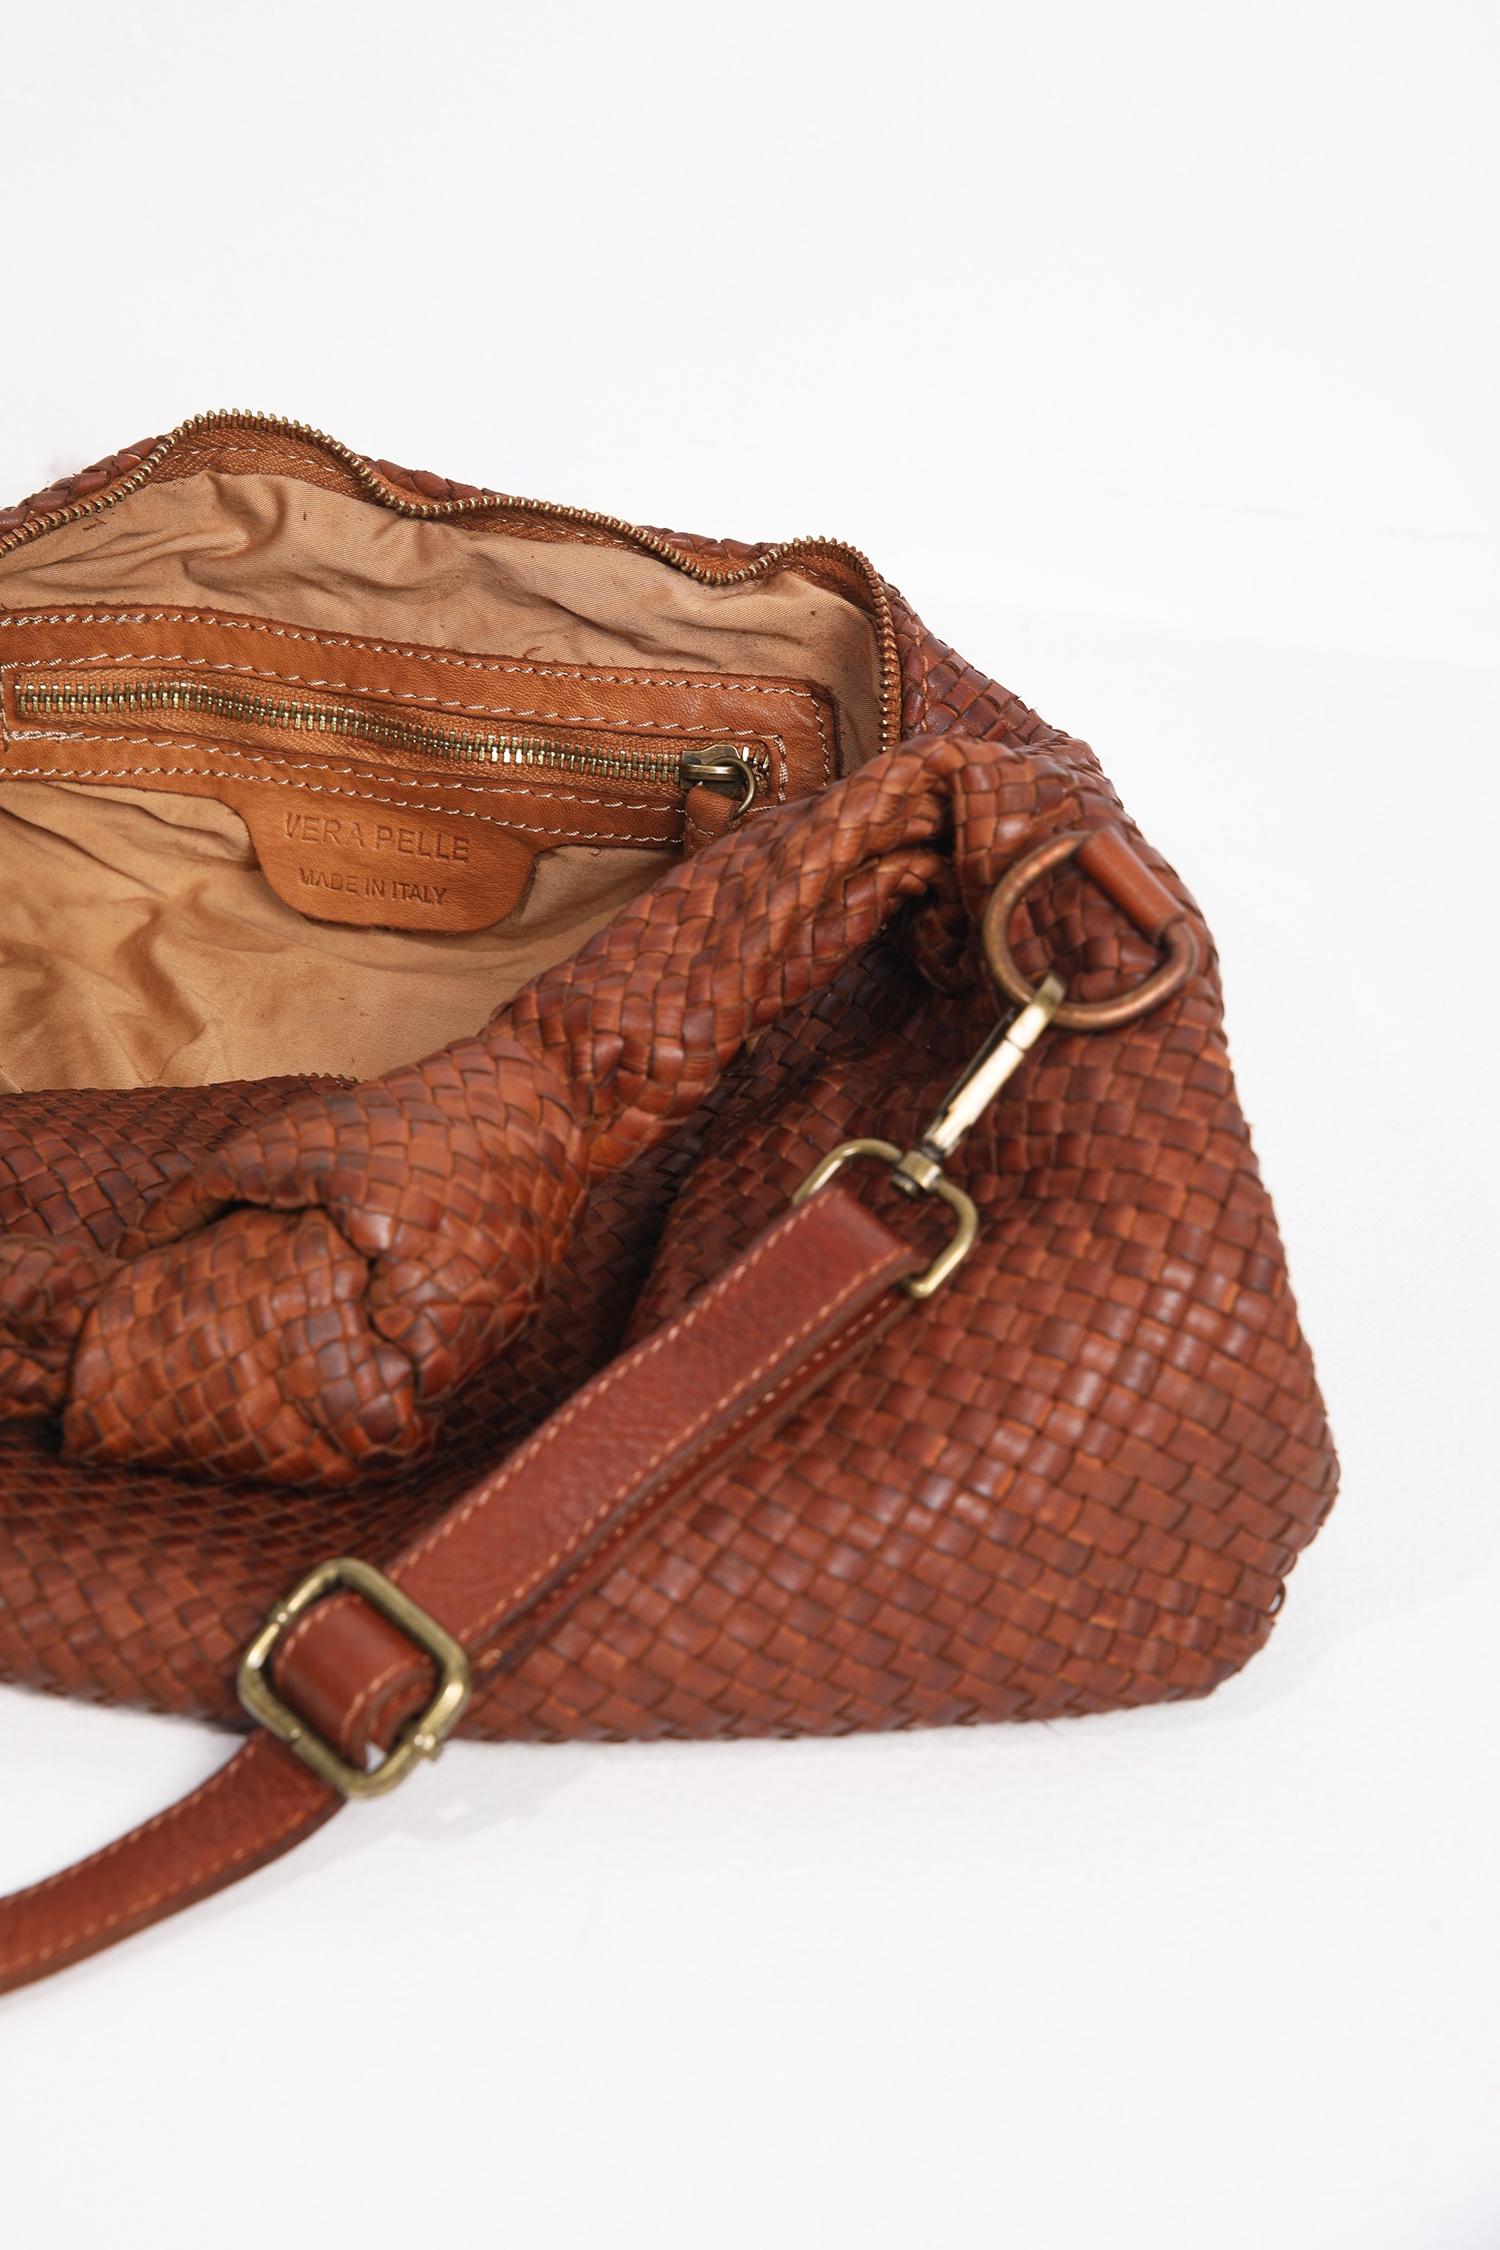 Braided leather bag